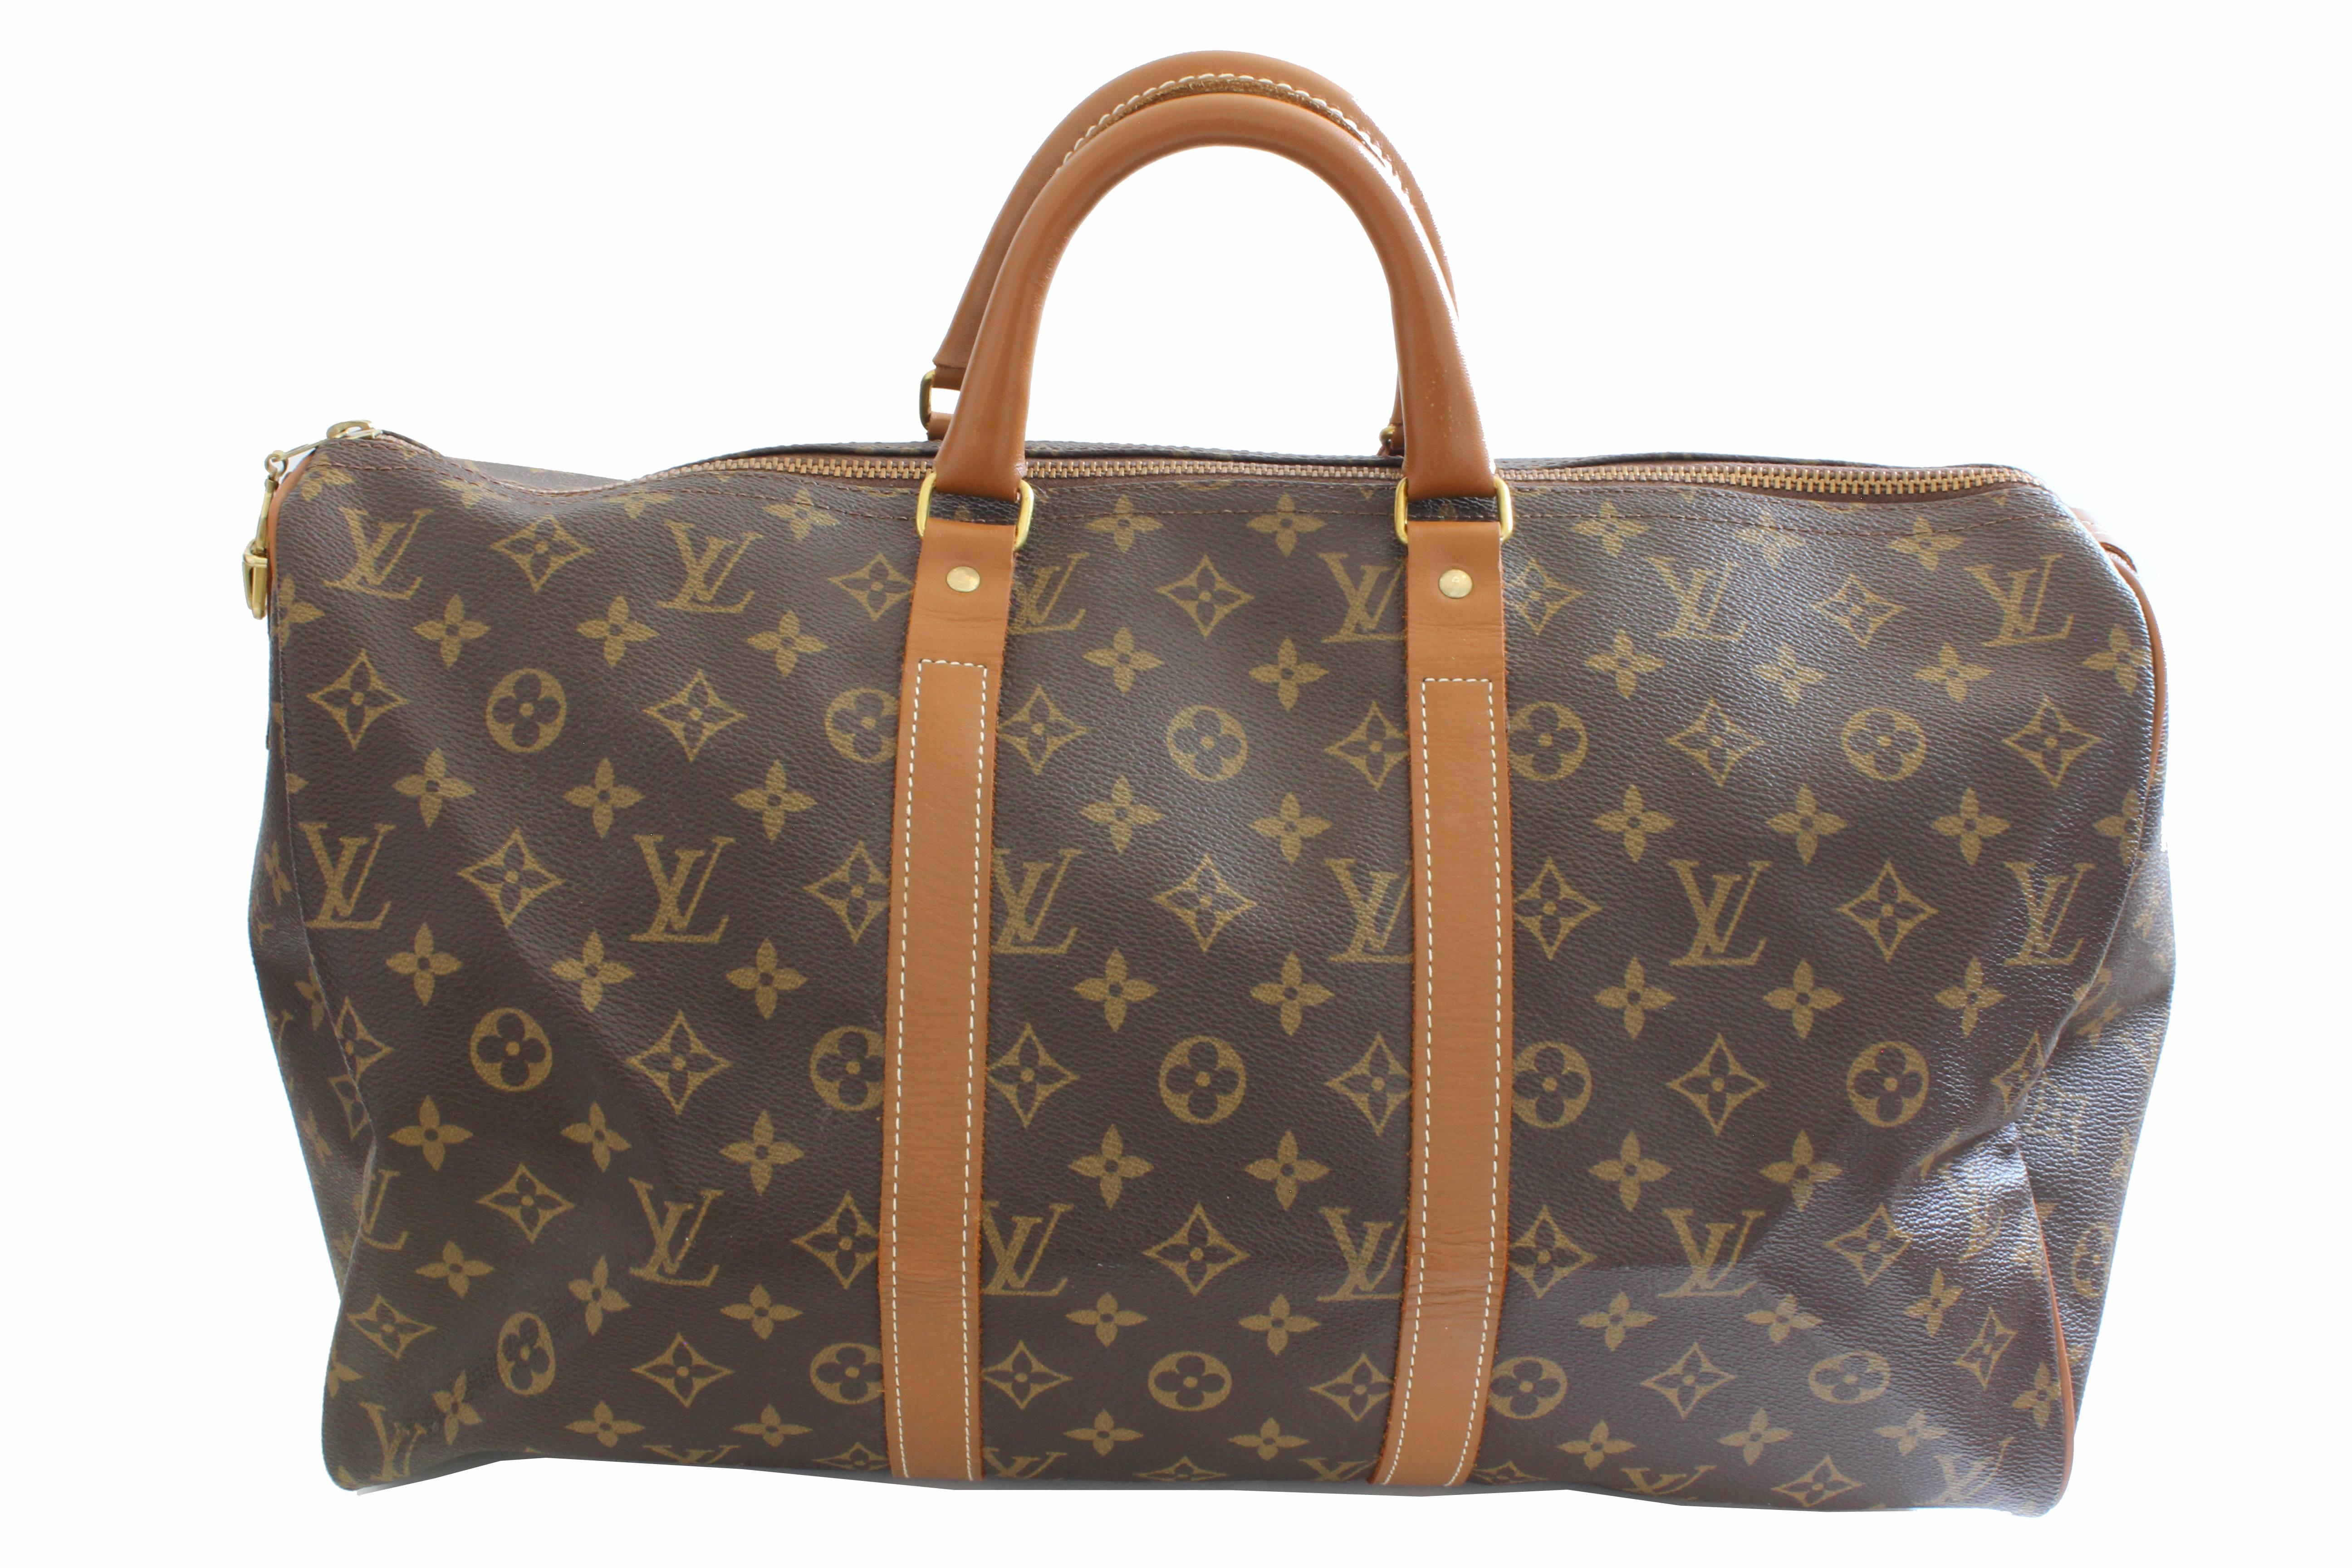 47d1e1539da4 70s Louis Vuitton Monogram Keepall Travel Duffle Bag French Company 45cm  Rare For Sale at 1stdibs